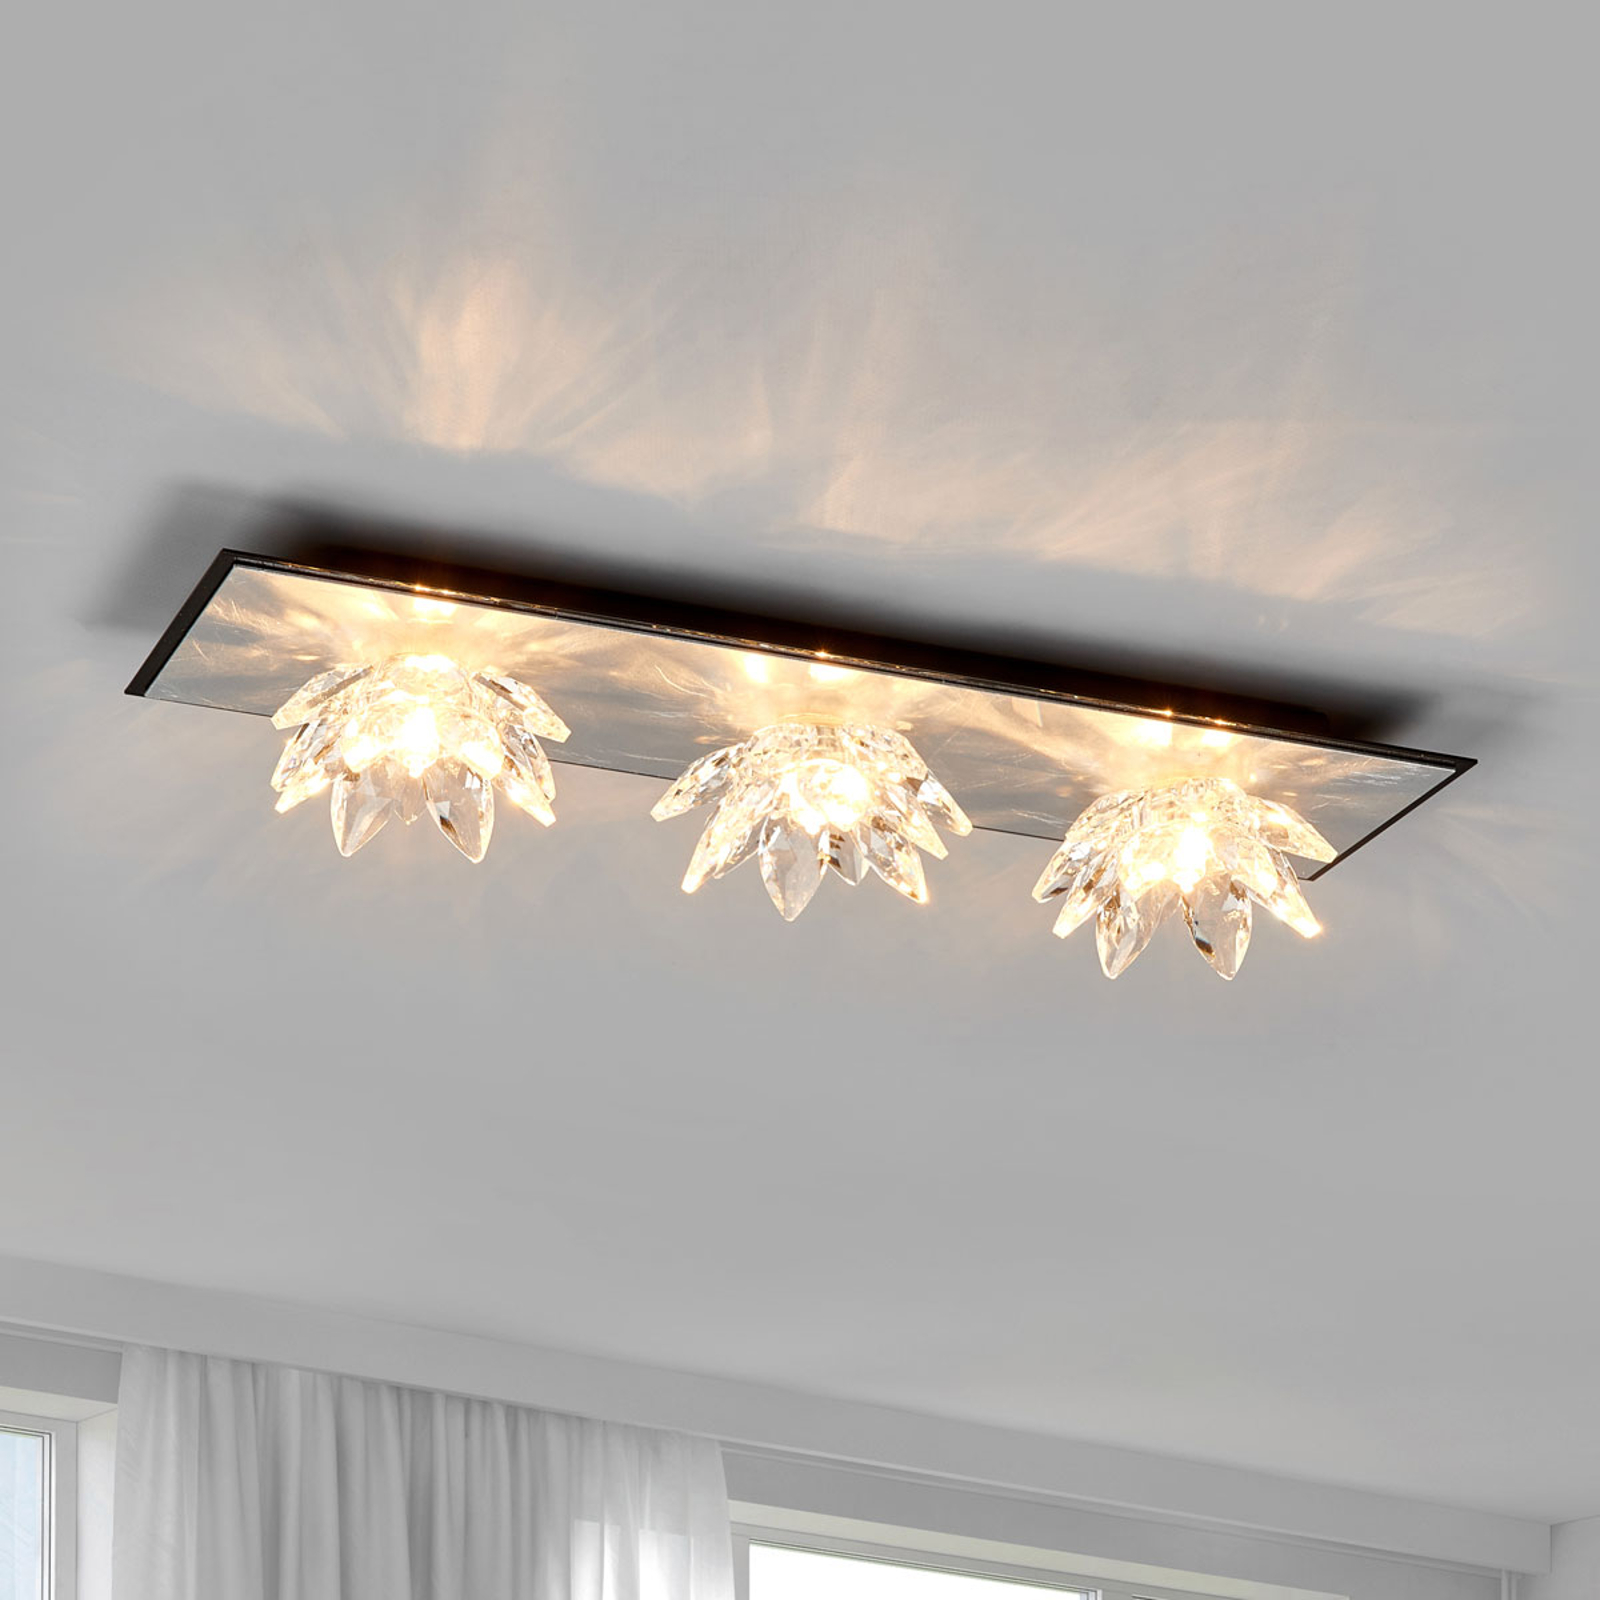 Fiore Cristallo bladzilveren plafondlamp 3 lampjes